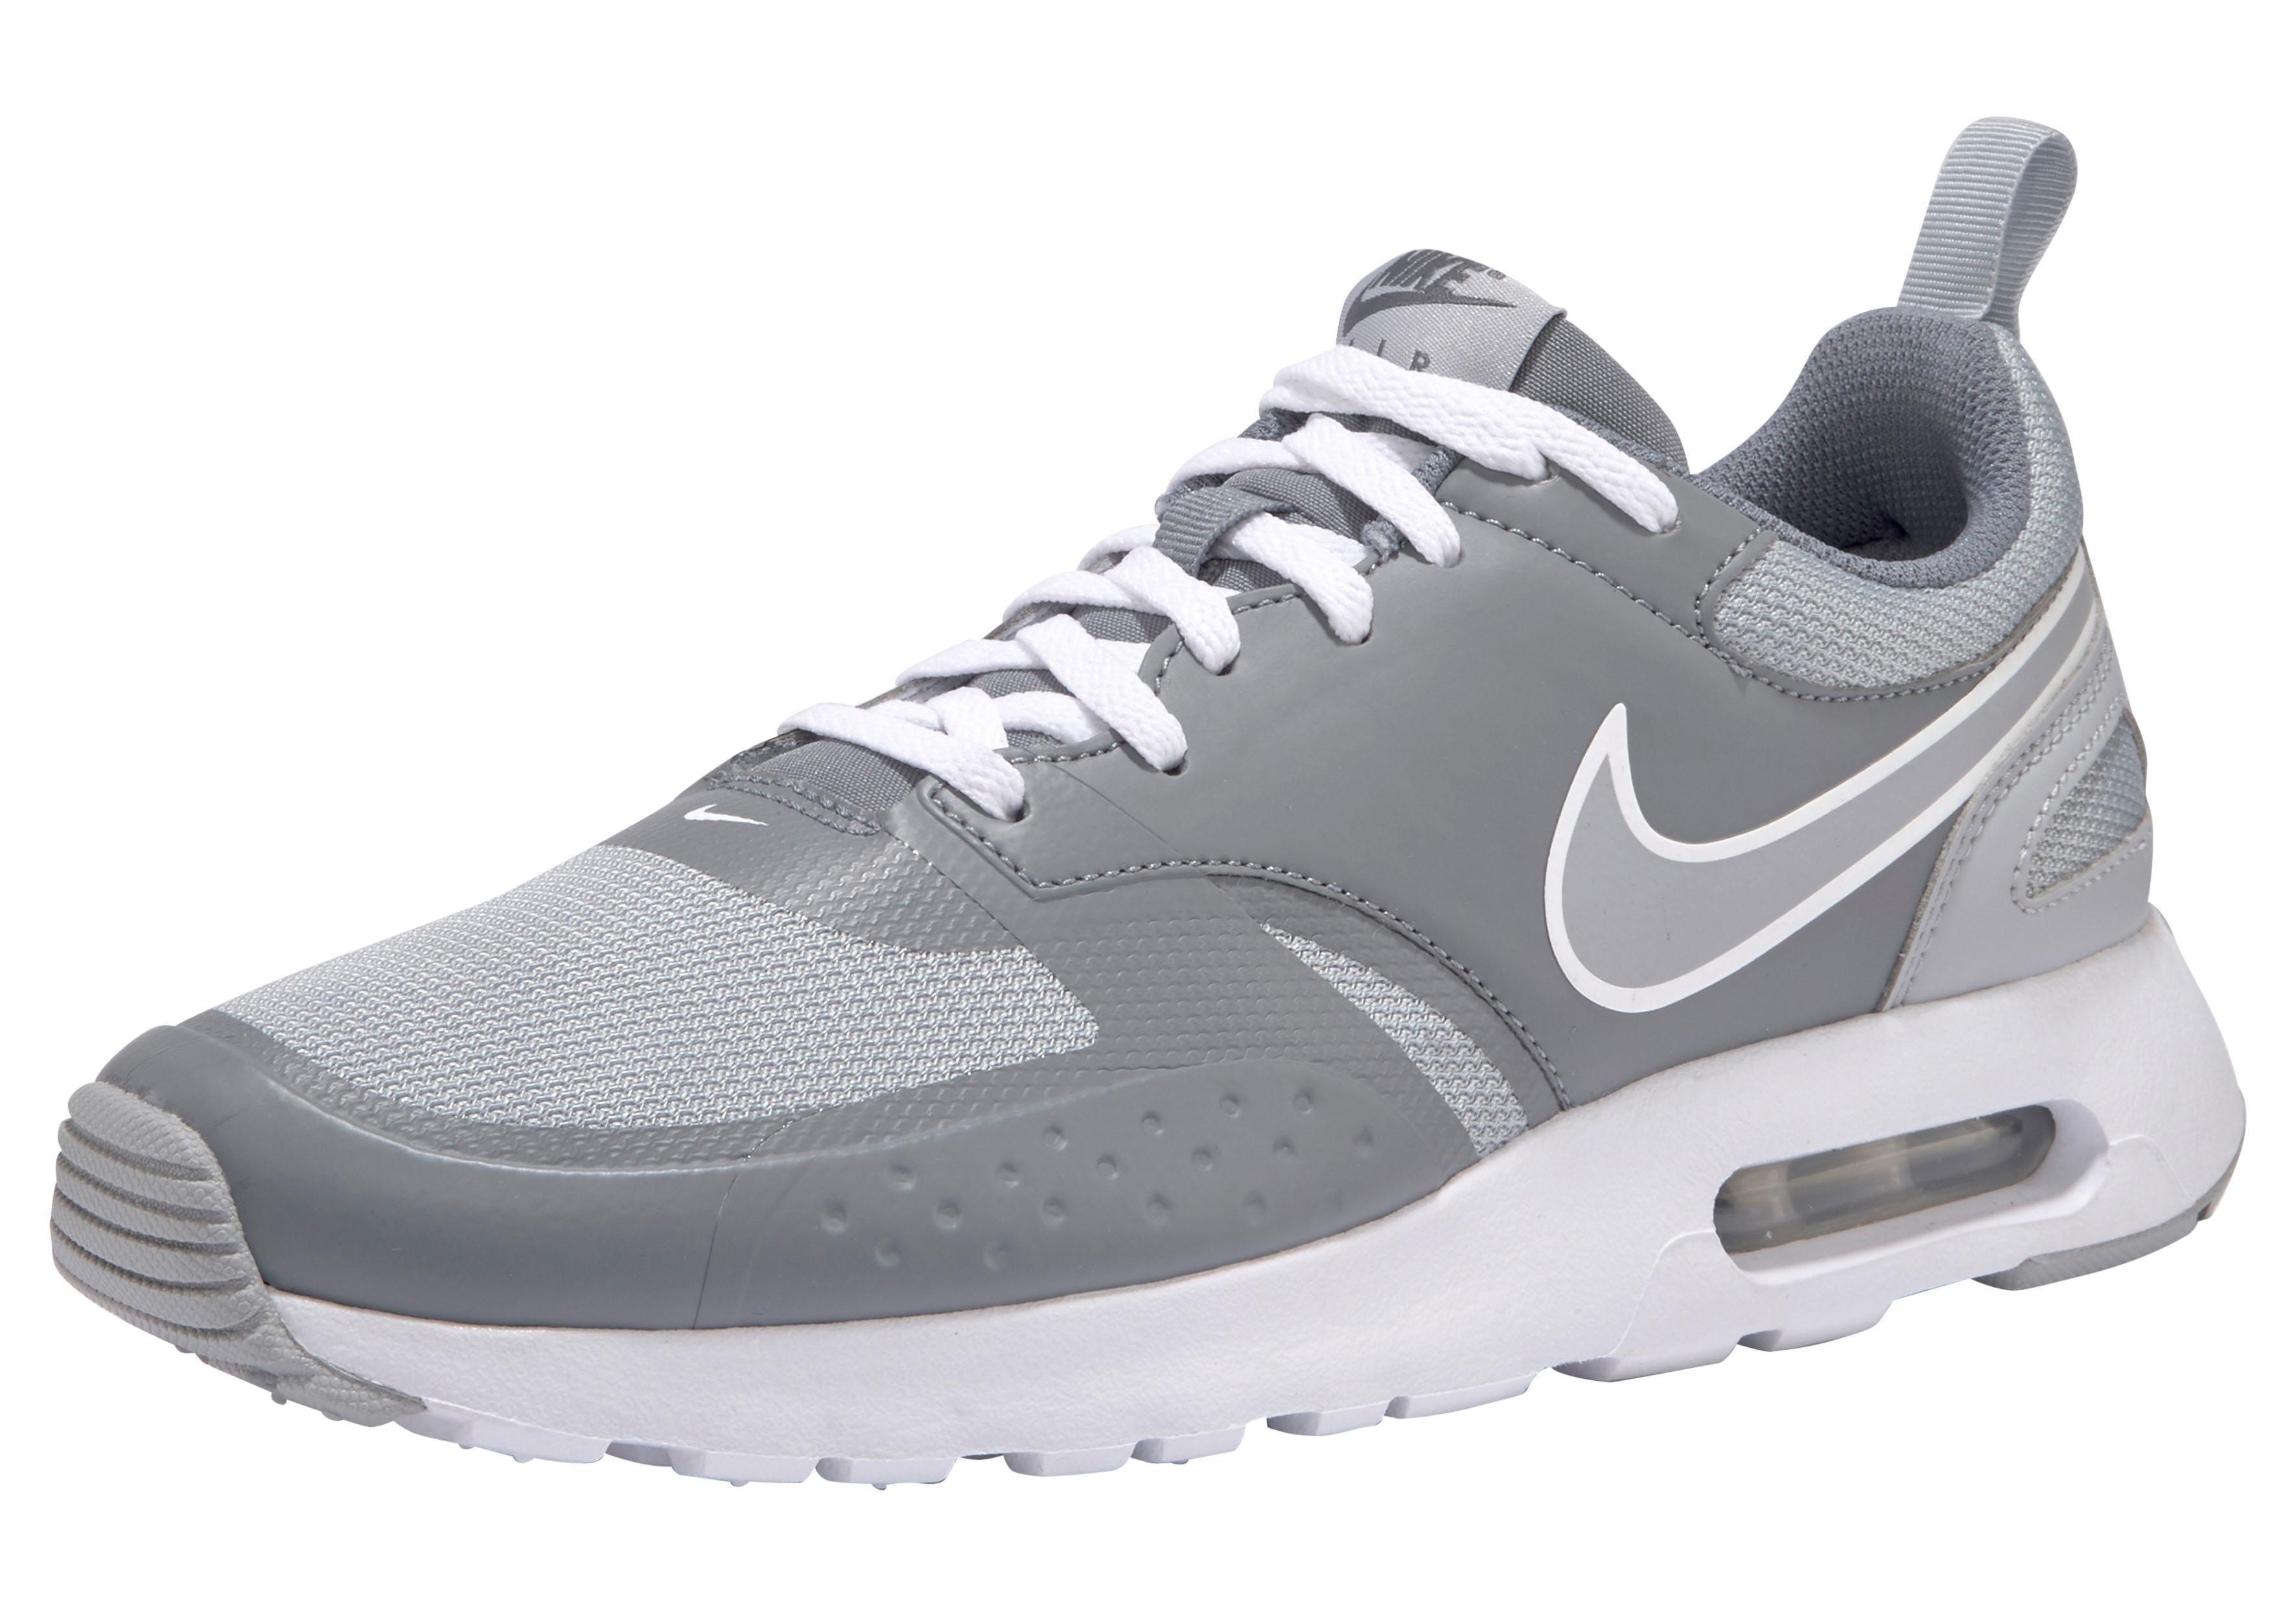 quality design dd116 391de Afbeeldingsbron Nike Sportswear sneakers »Air Max Vision«